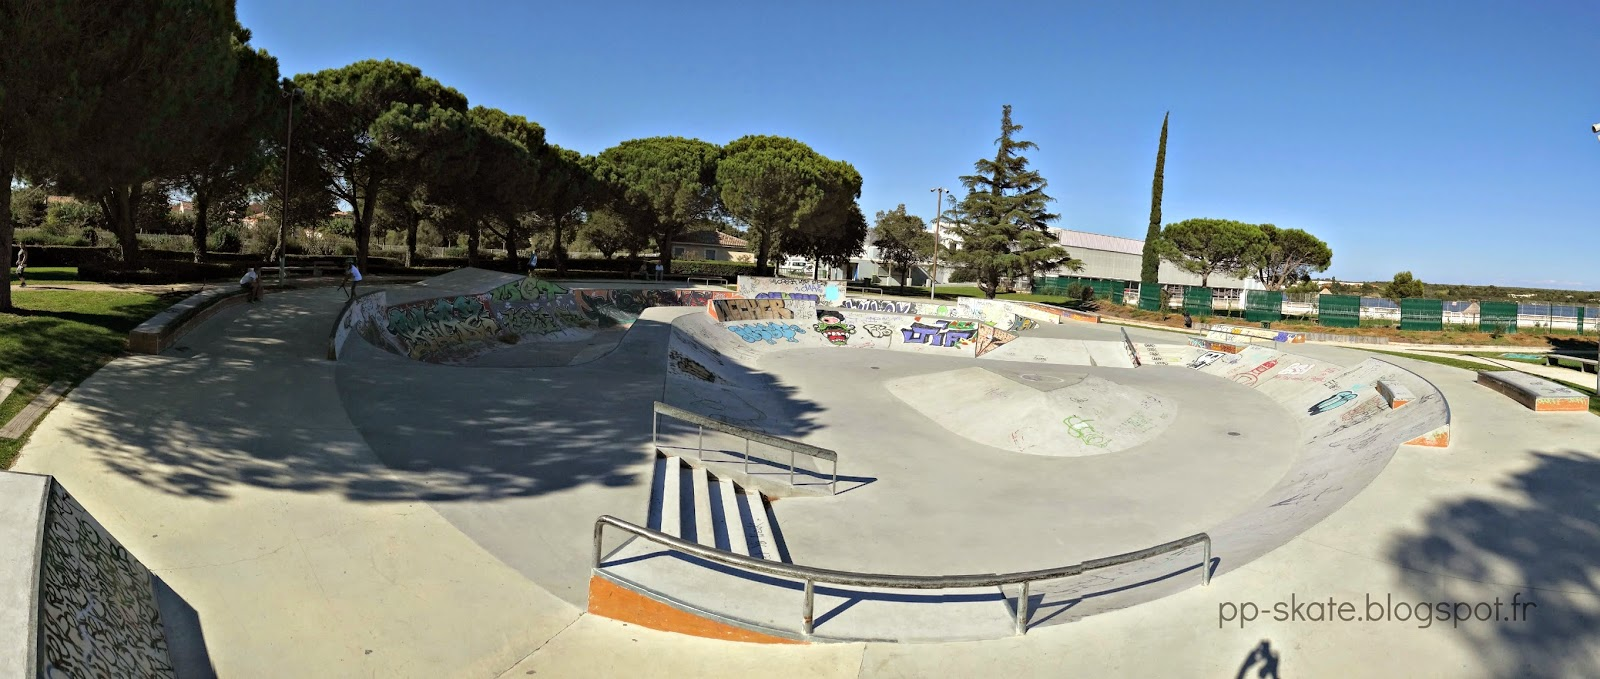 skatepark Fos sur mer adresse